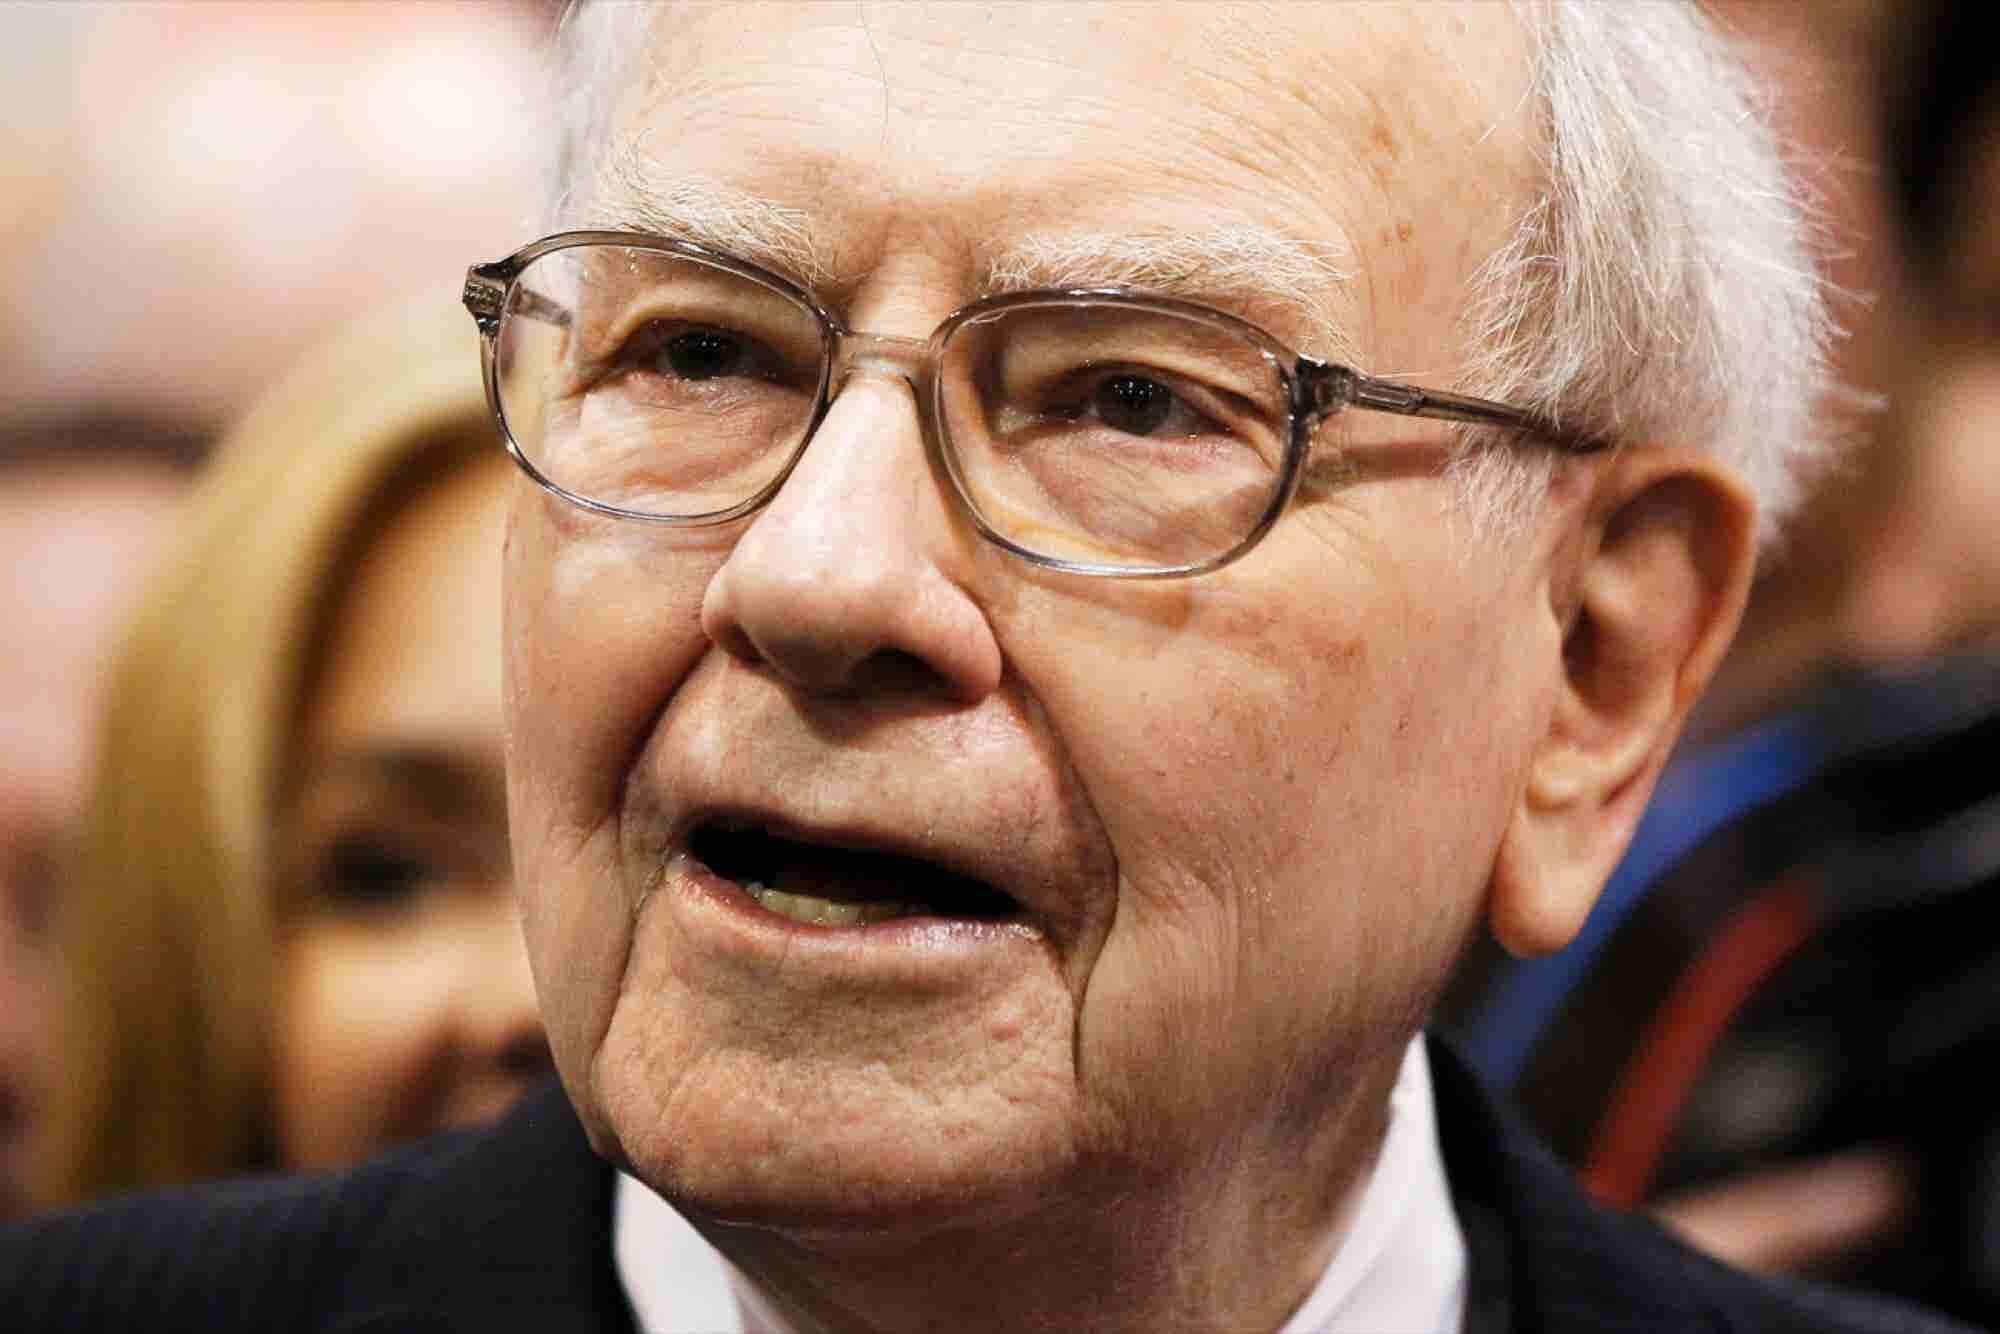 Why Warren Buffett Is the Mahatma Gandhi of Capitalism